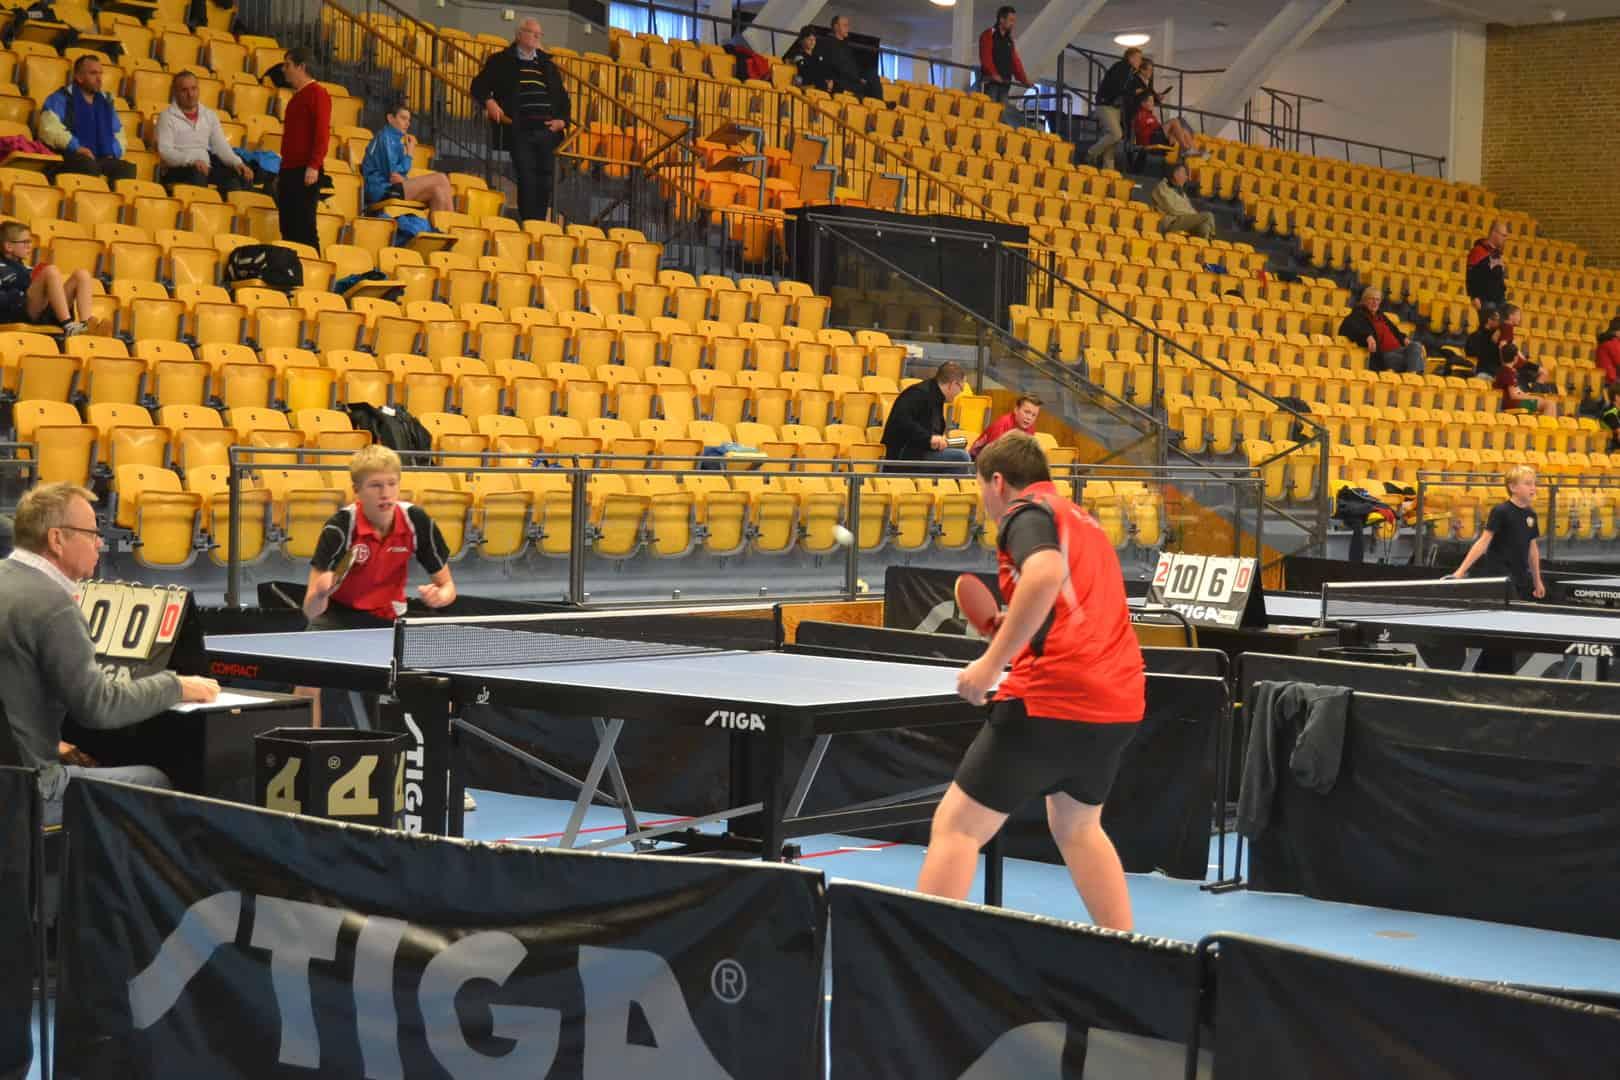 Rekord Spelen, Helsingborg 2013